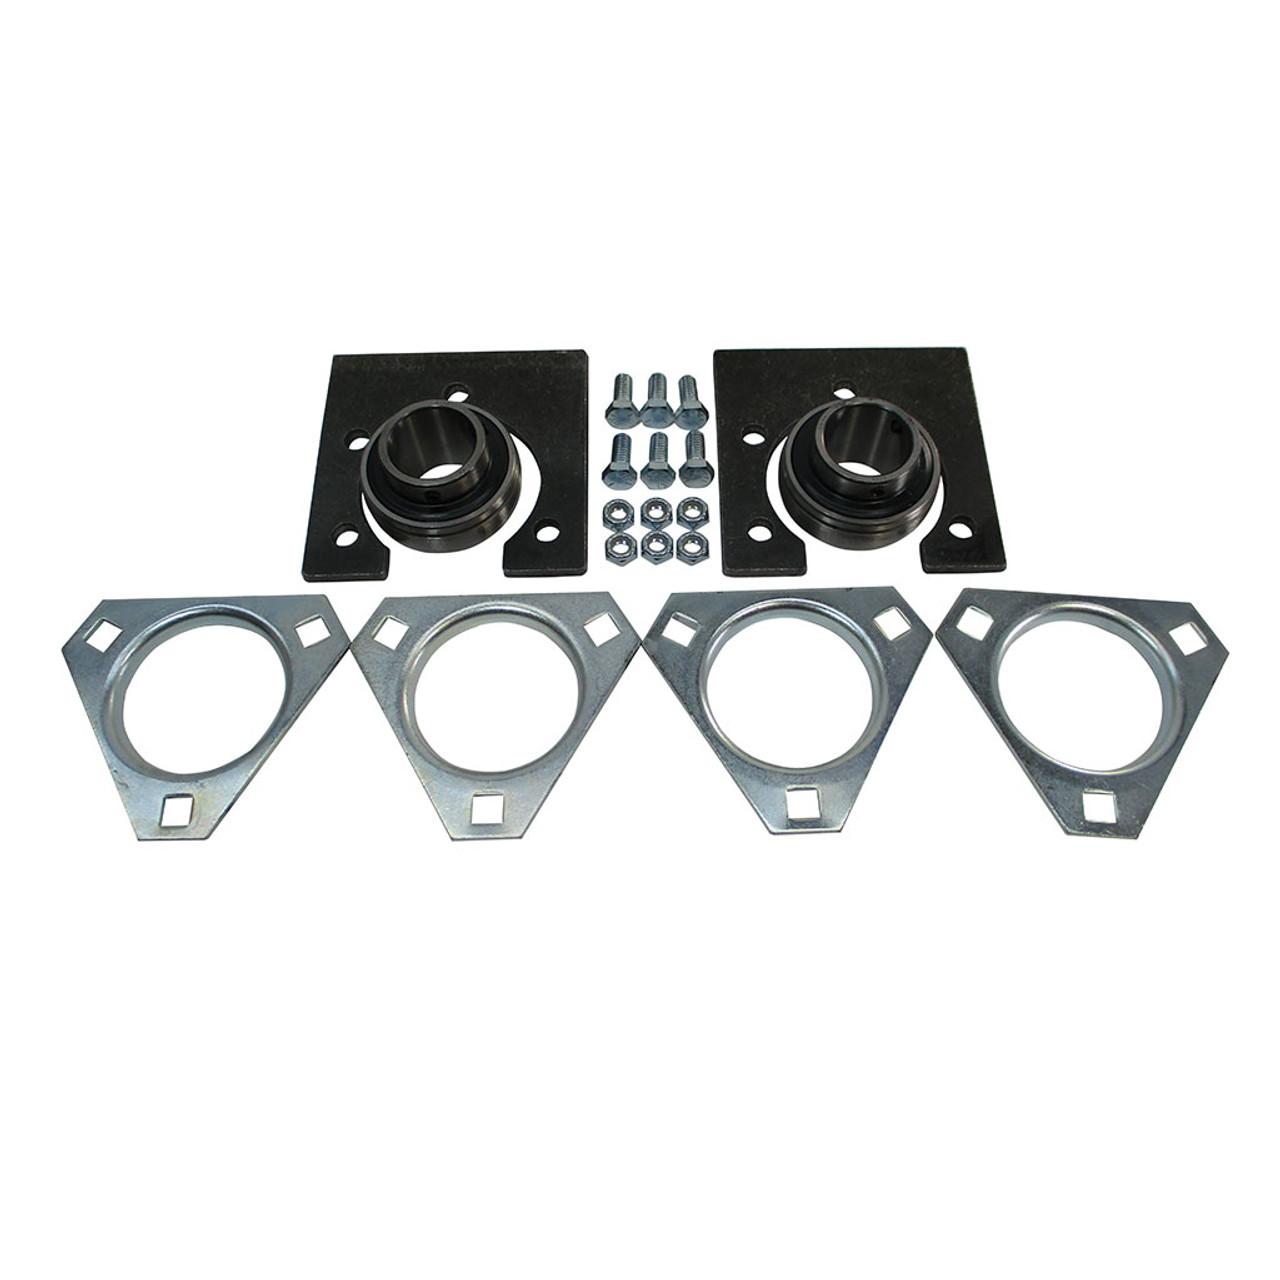 "1-1/4"" Standard Live Axle Bearing Kit, 3-Hole Flangettes"